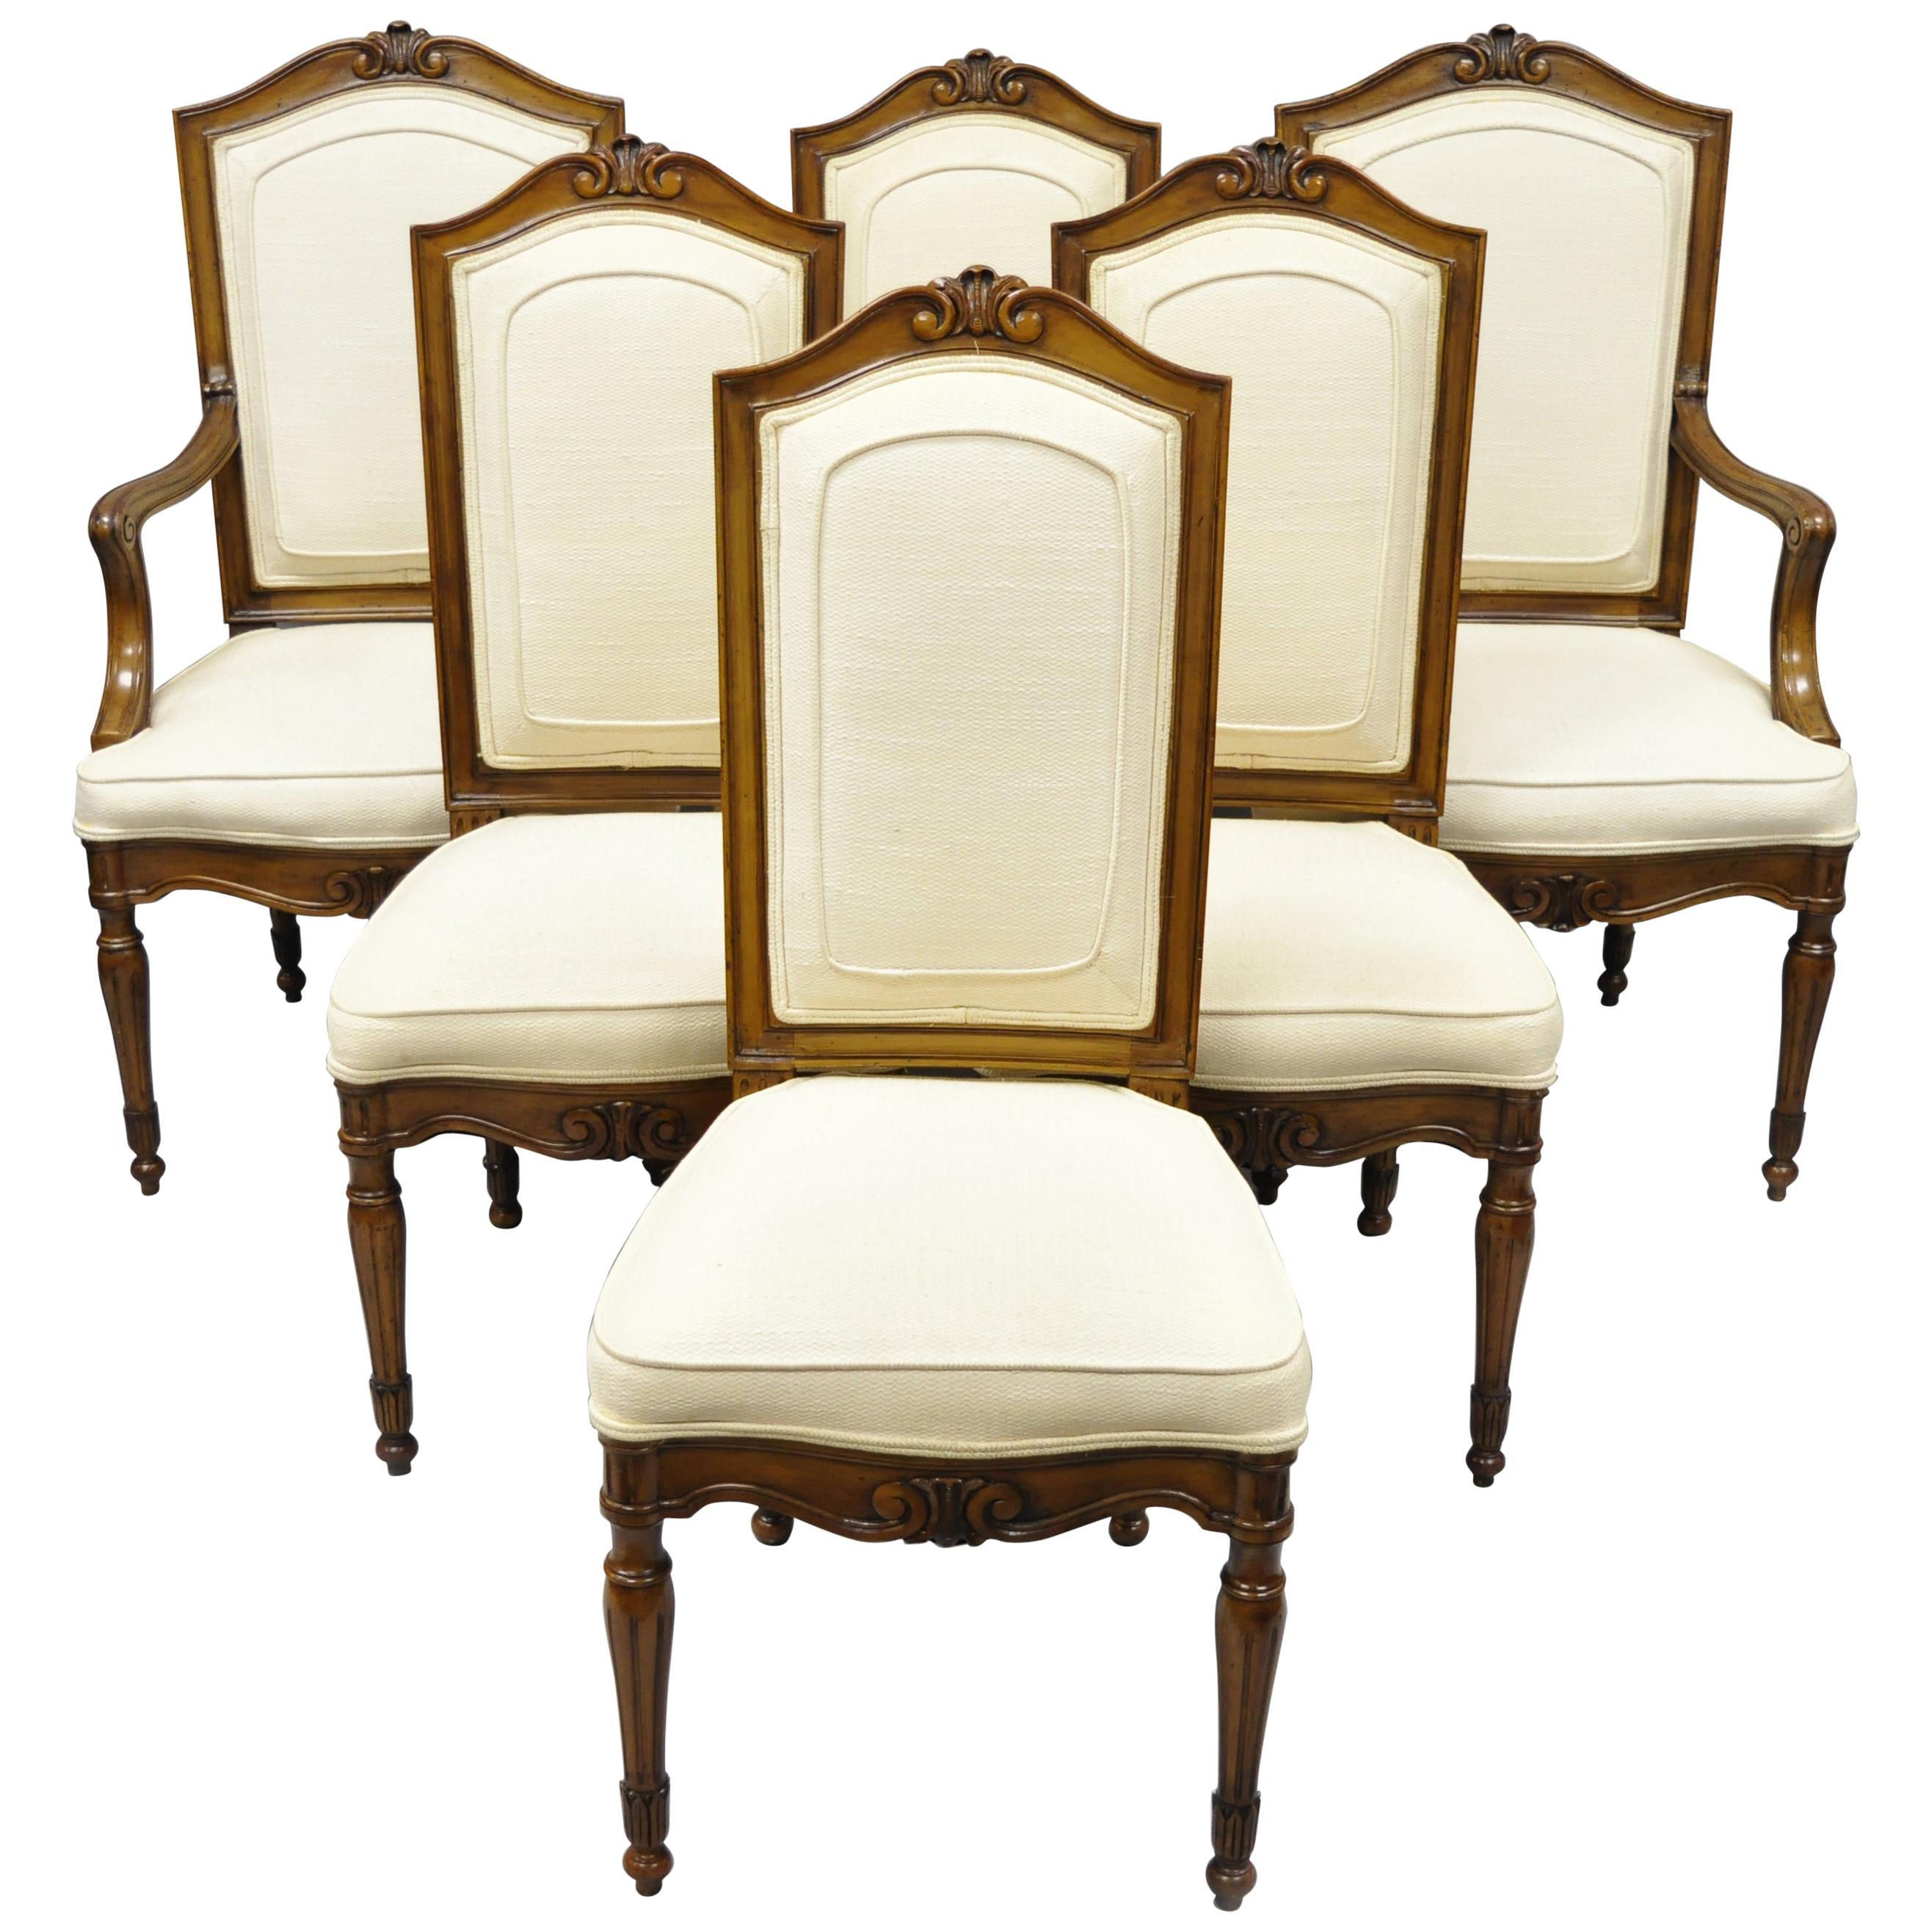 6 Italian Regency French Louis XVI Style Dining Chairs by John Widdicomb